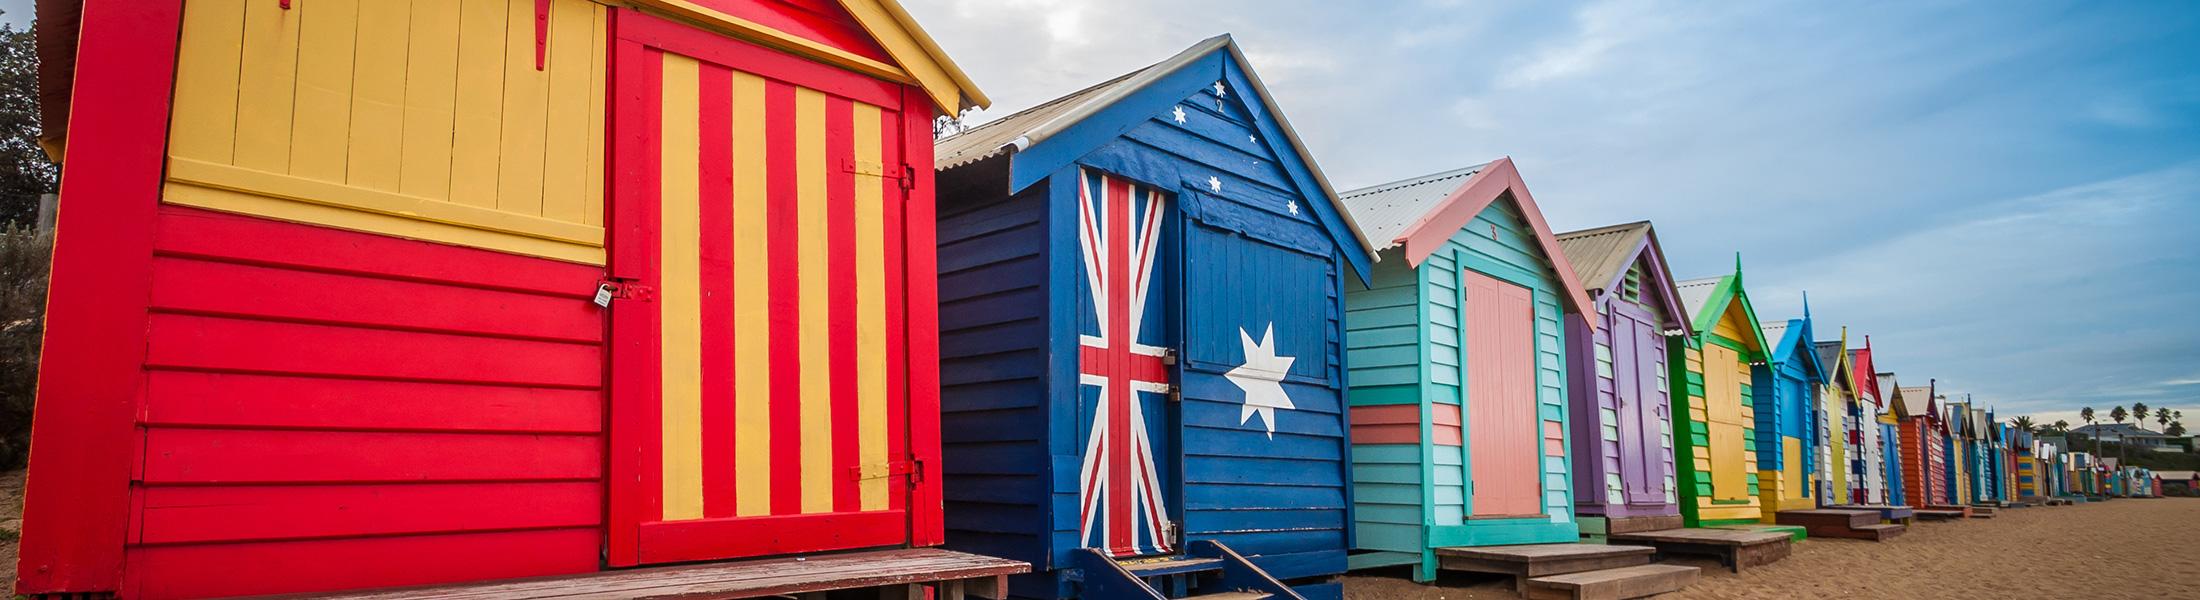 Beach huts on St Kilda Beach in Australia